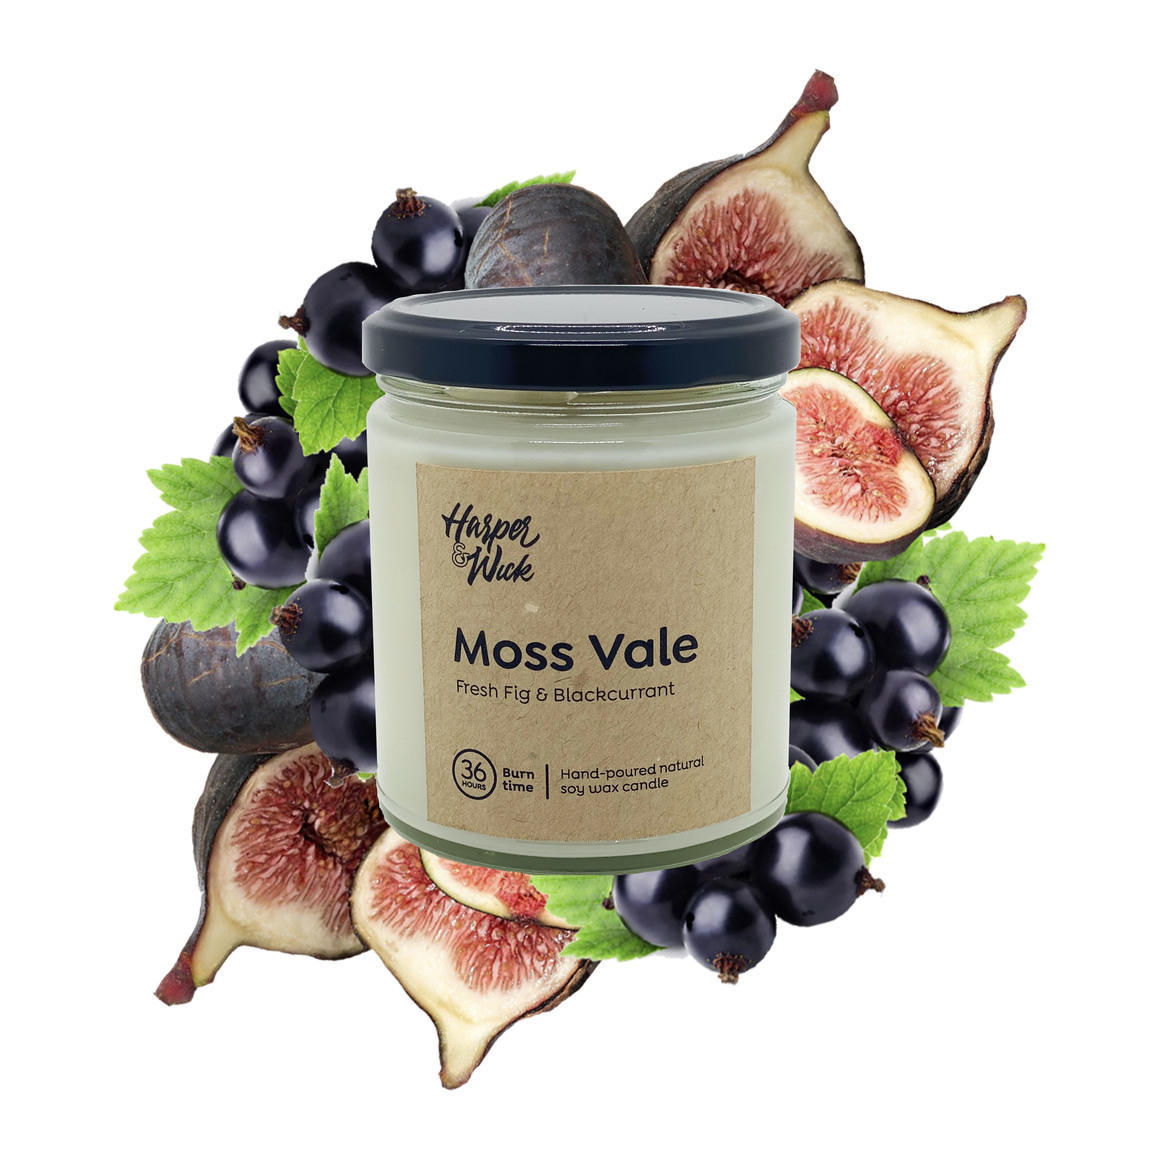 Moss Vale - Fresh Fig & Blackcurrant | Trada Marketplace